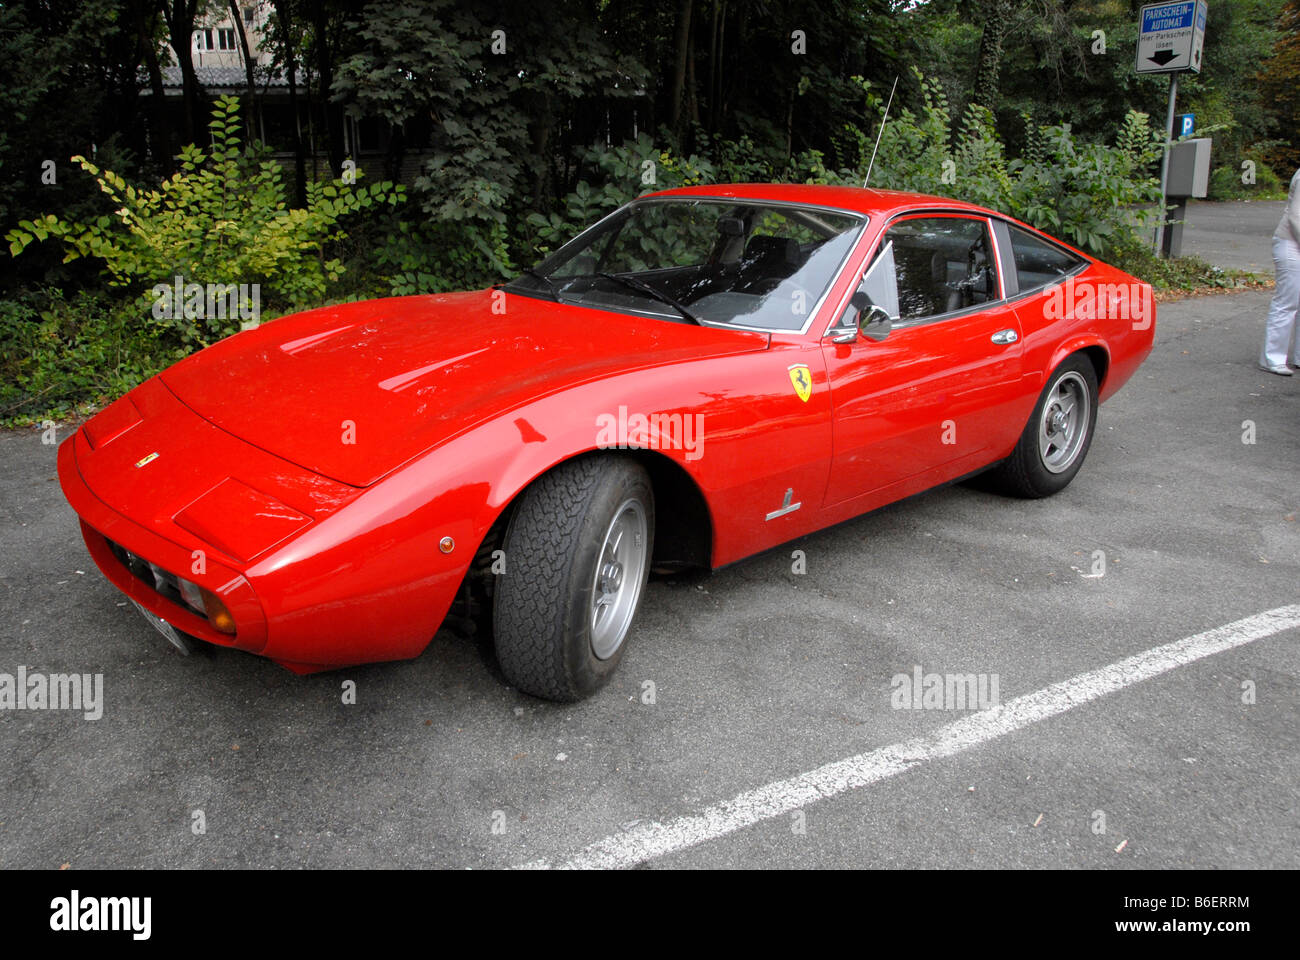 4 365 Stock Photos Images Alamy 1971 Ferrari Daytona Engine Diagram Gtc Retro Motor Vintage Car Festival Tuebingen Baden